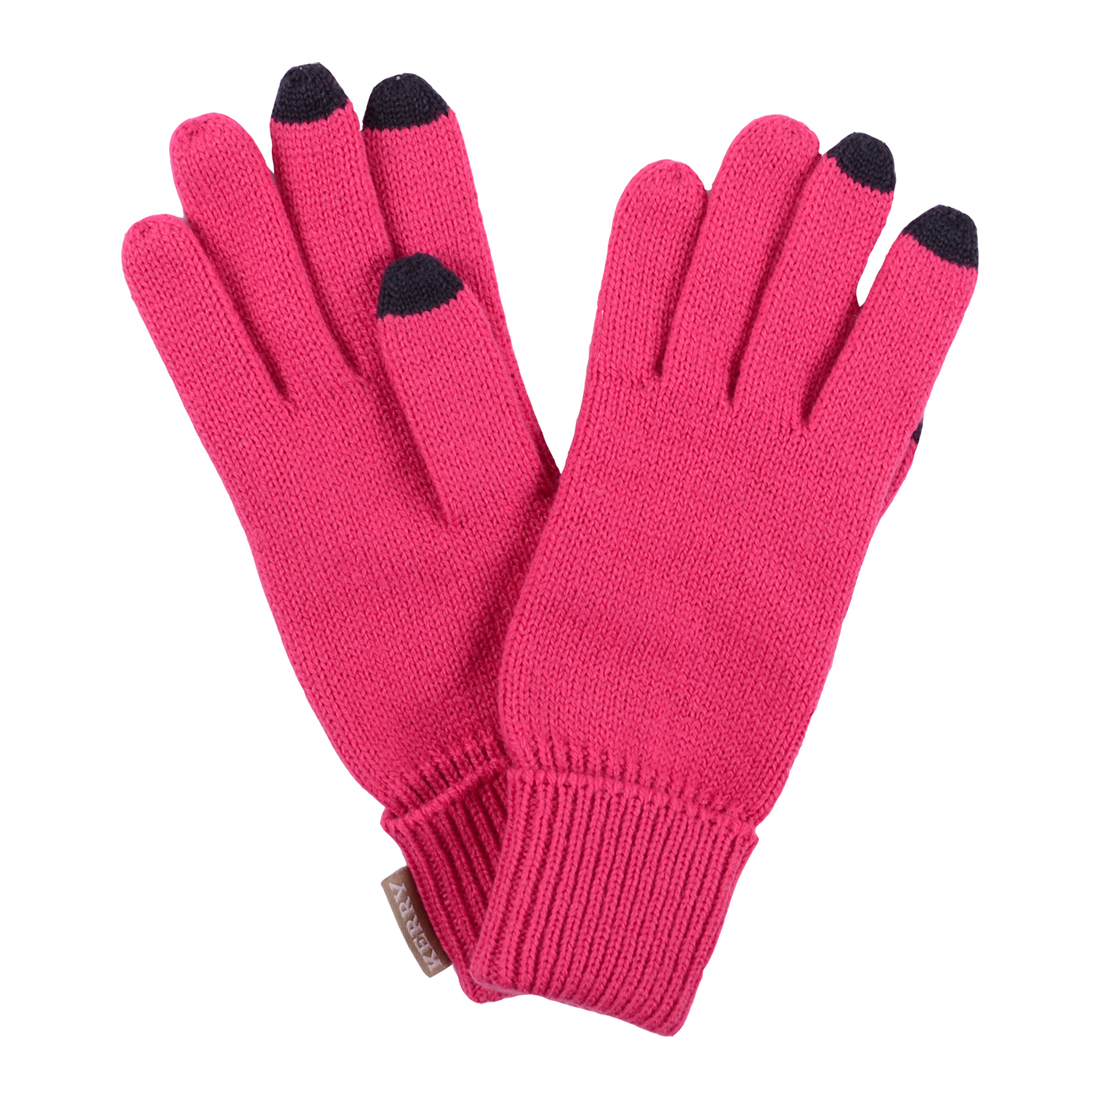 Купить Перчатки KERRY TOUCH K16594, размер 4,